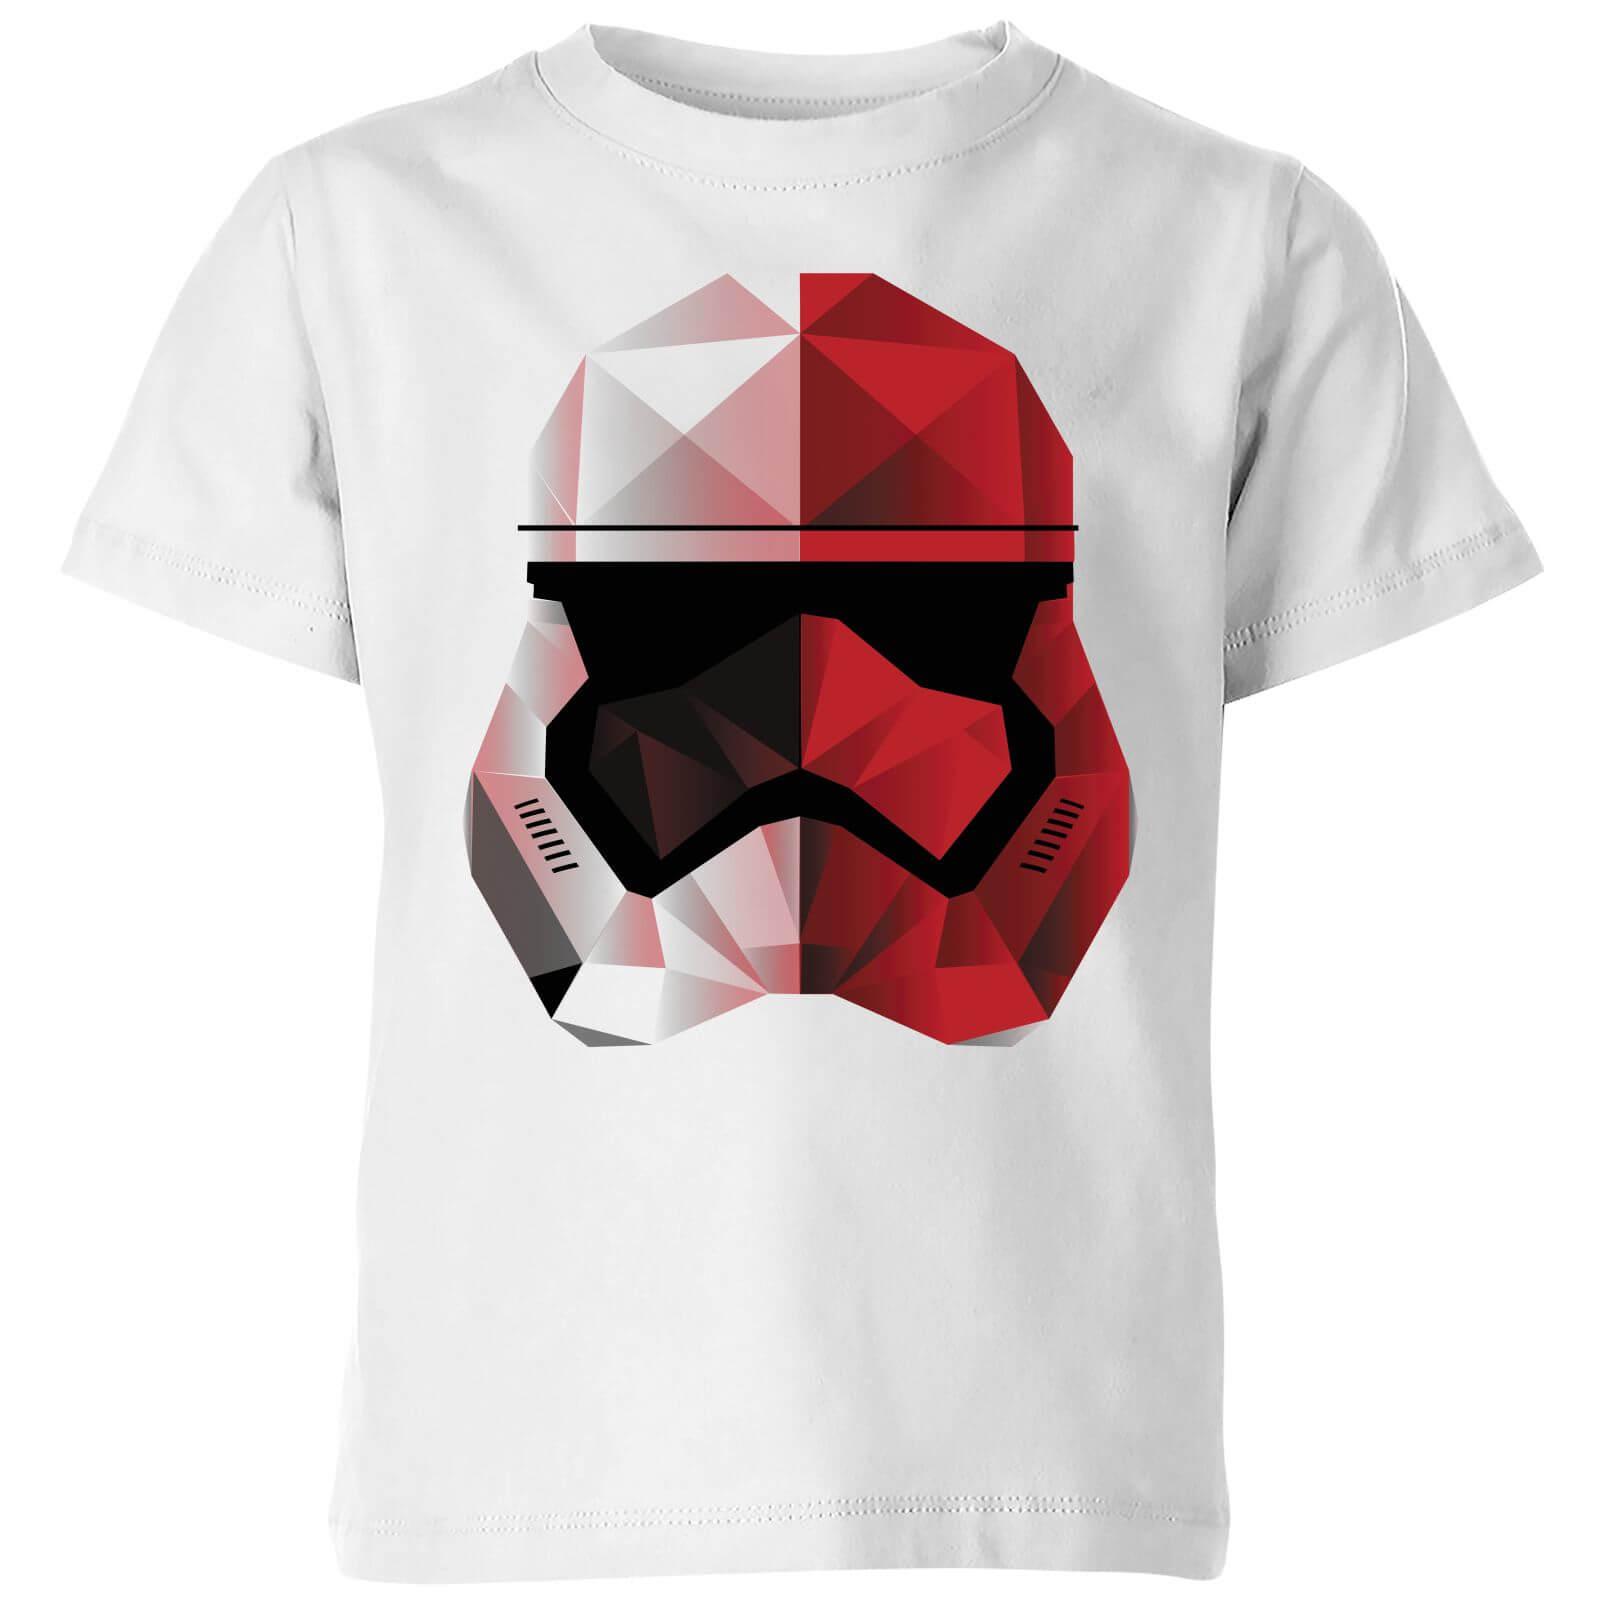 Star Wars T-Shirt Enfant Casque Stormtrooper Effet Cubiste - Star Wars - Blanc - 5-6 ans - Blanc